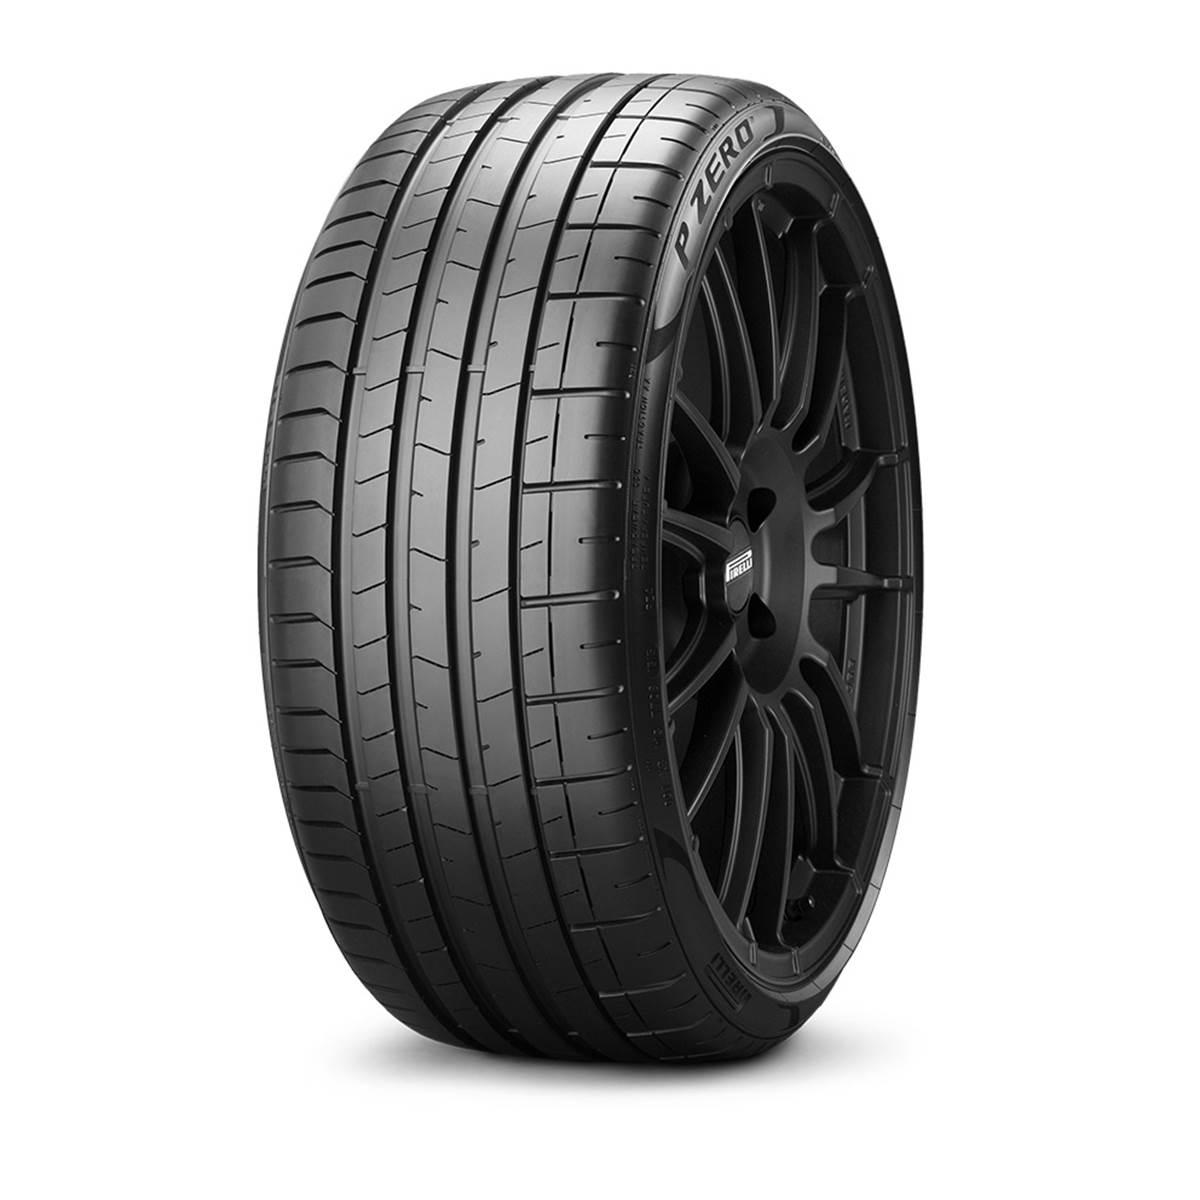 Pneu Pirelli 265/45R18 101Y P-Zero homologué Porsche